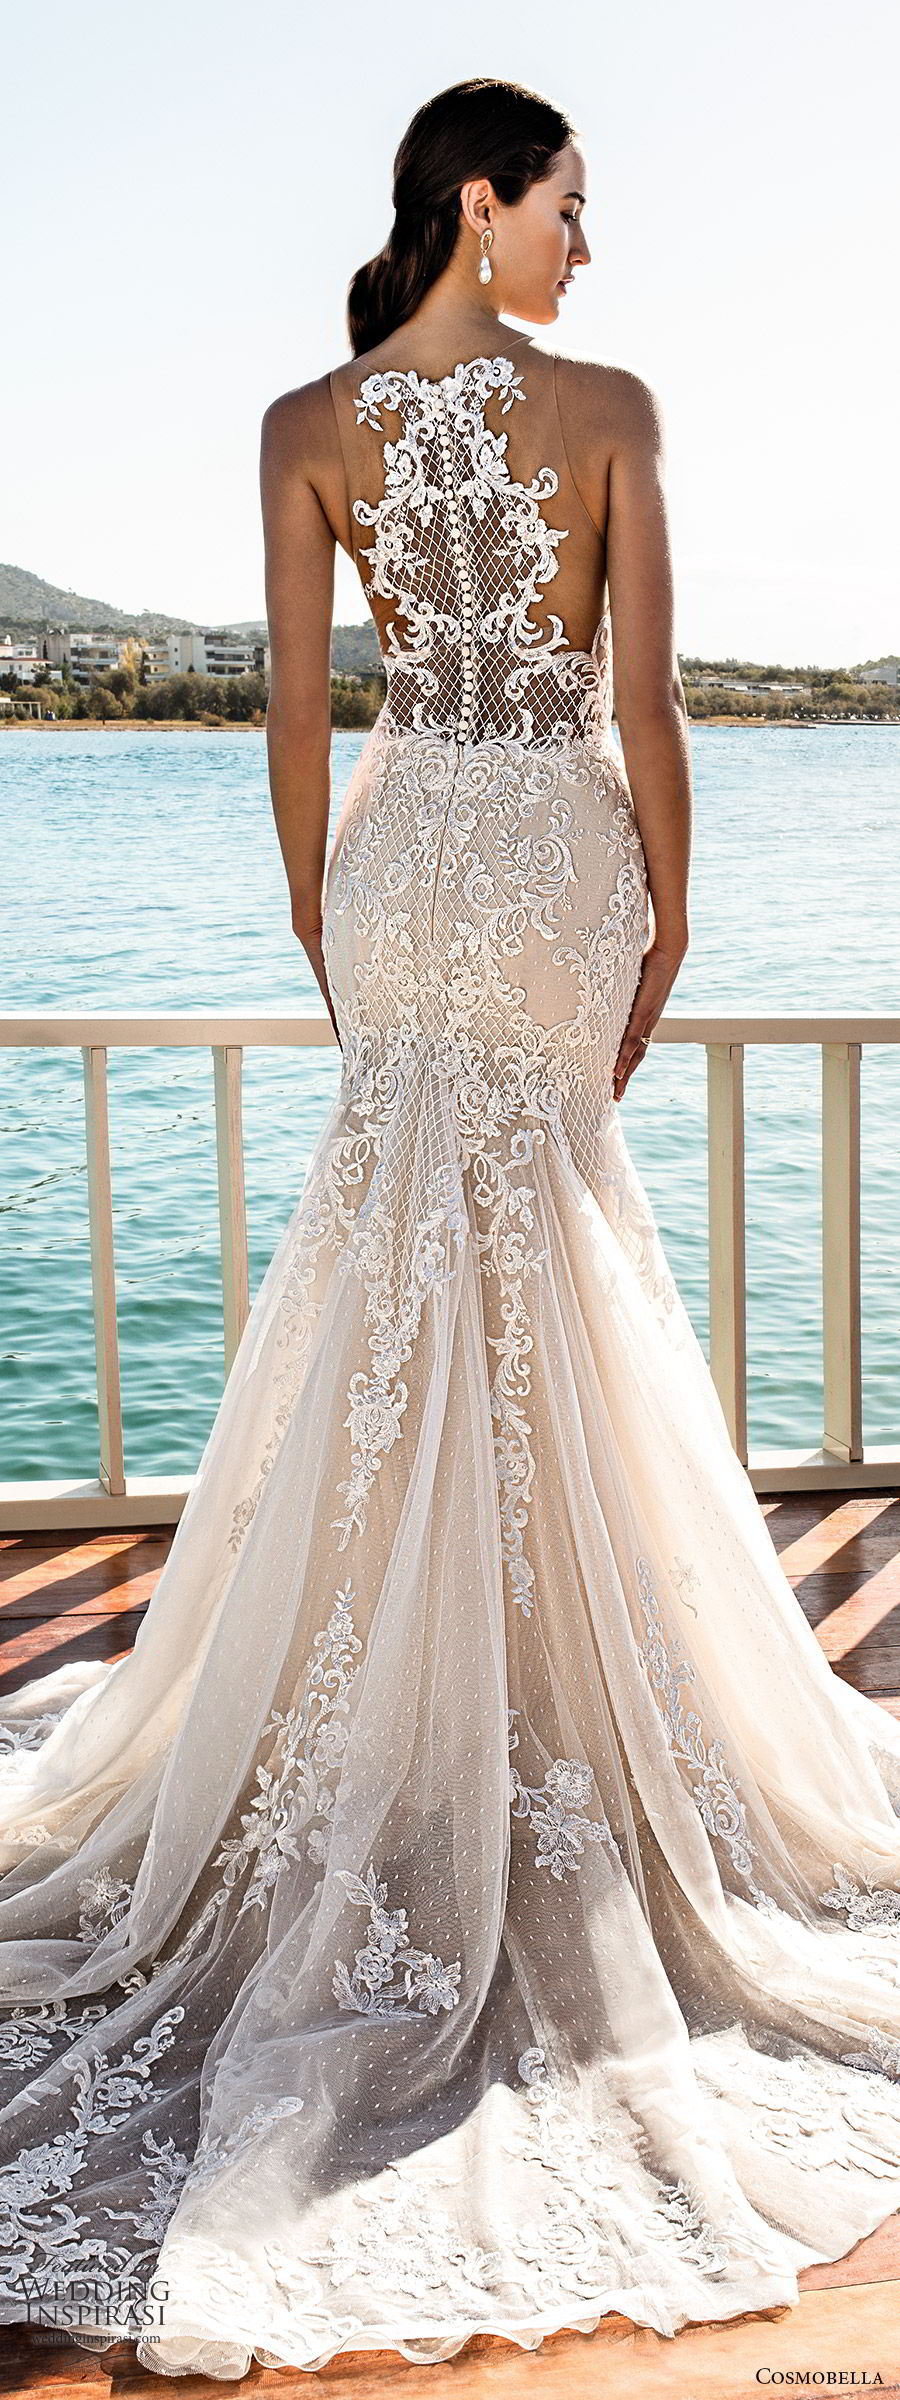 cosmobella 2020 bridal sleeveless illusion straps v neckline fully embellished sheath mermaid lace wedding dress (19) glam glitzy elegant illusion back chapel train bv